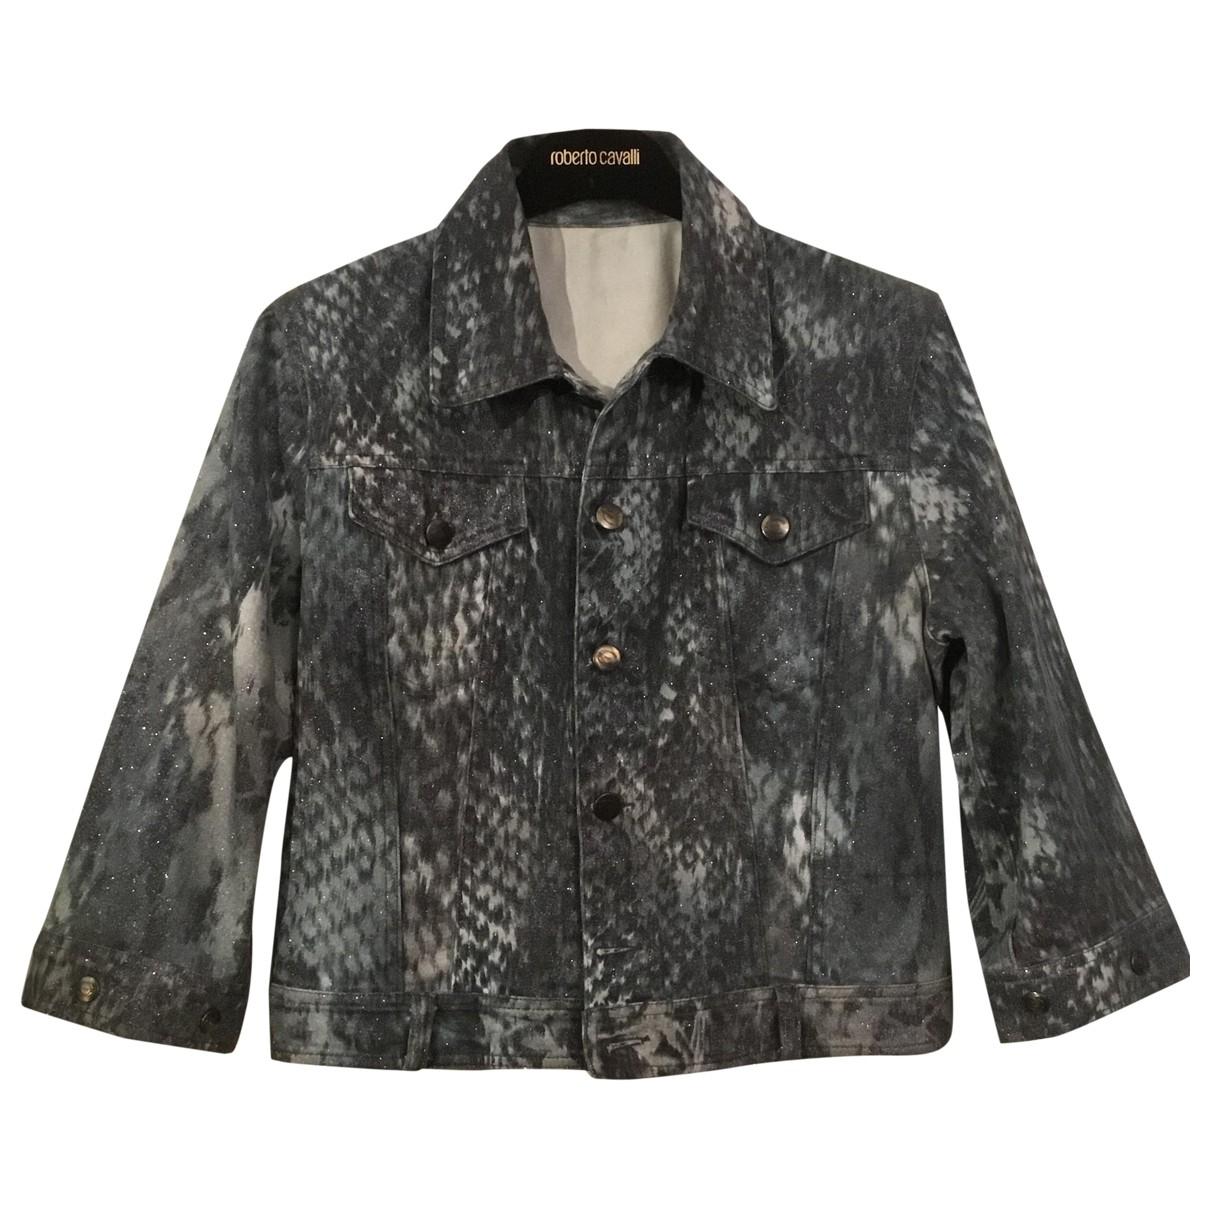 Just Cavalli \N Multicolour Denim - Jeans jacket for Women S International